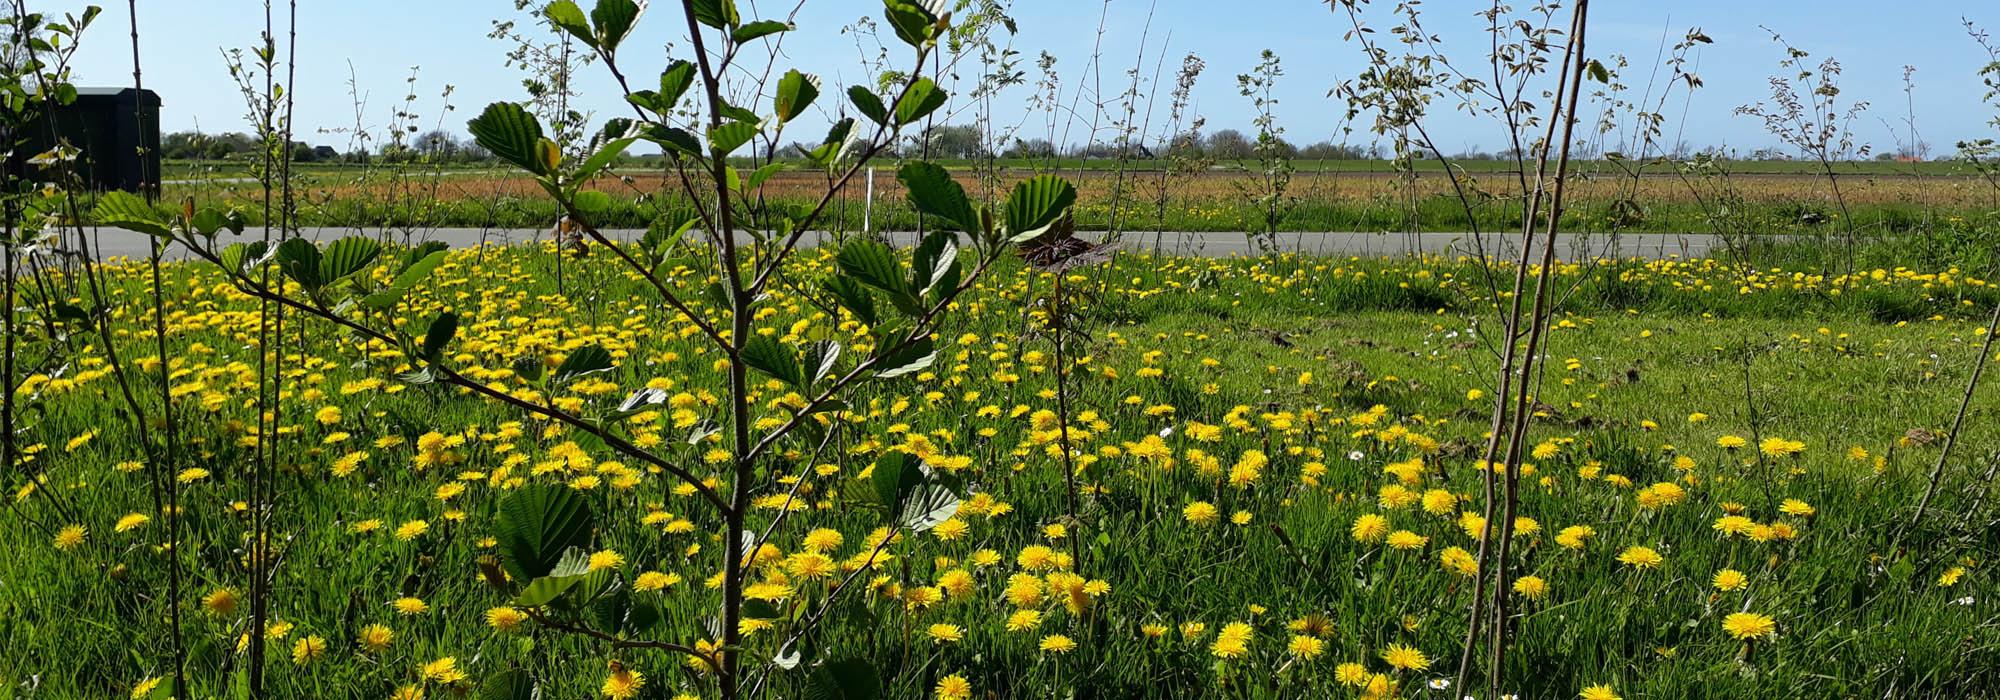 Texel tuin ontwerp natuur tekening rondleiding wandeling tuincoach hovenier